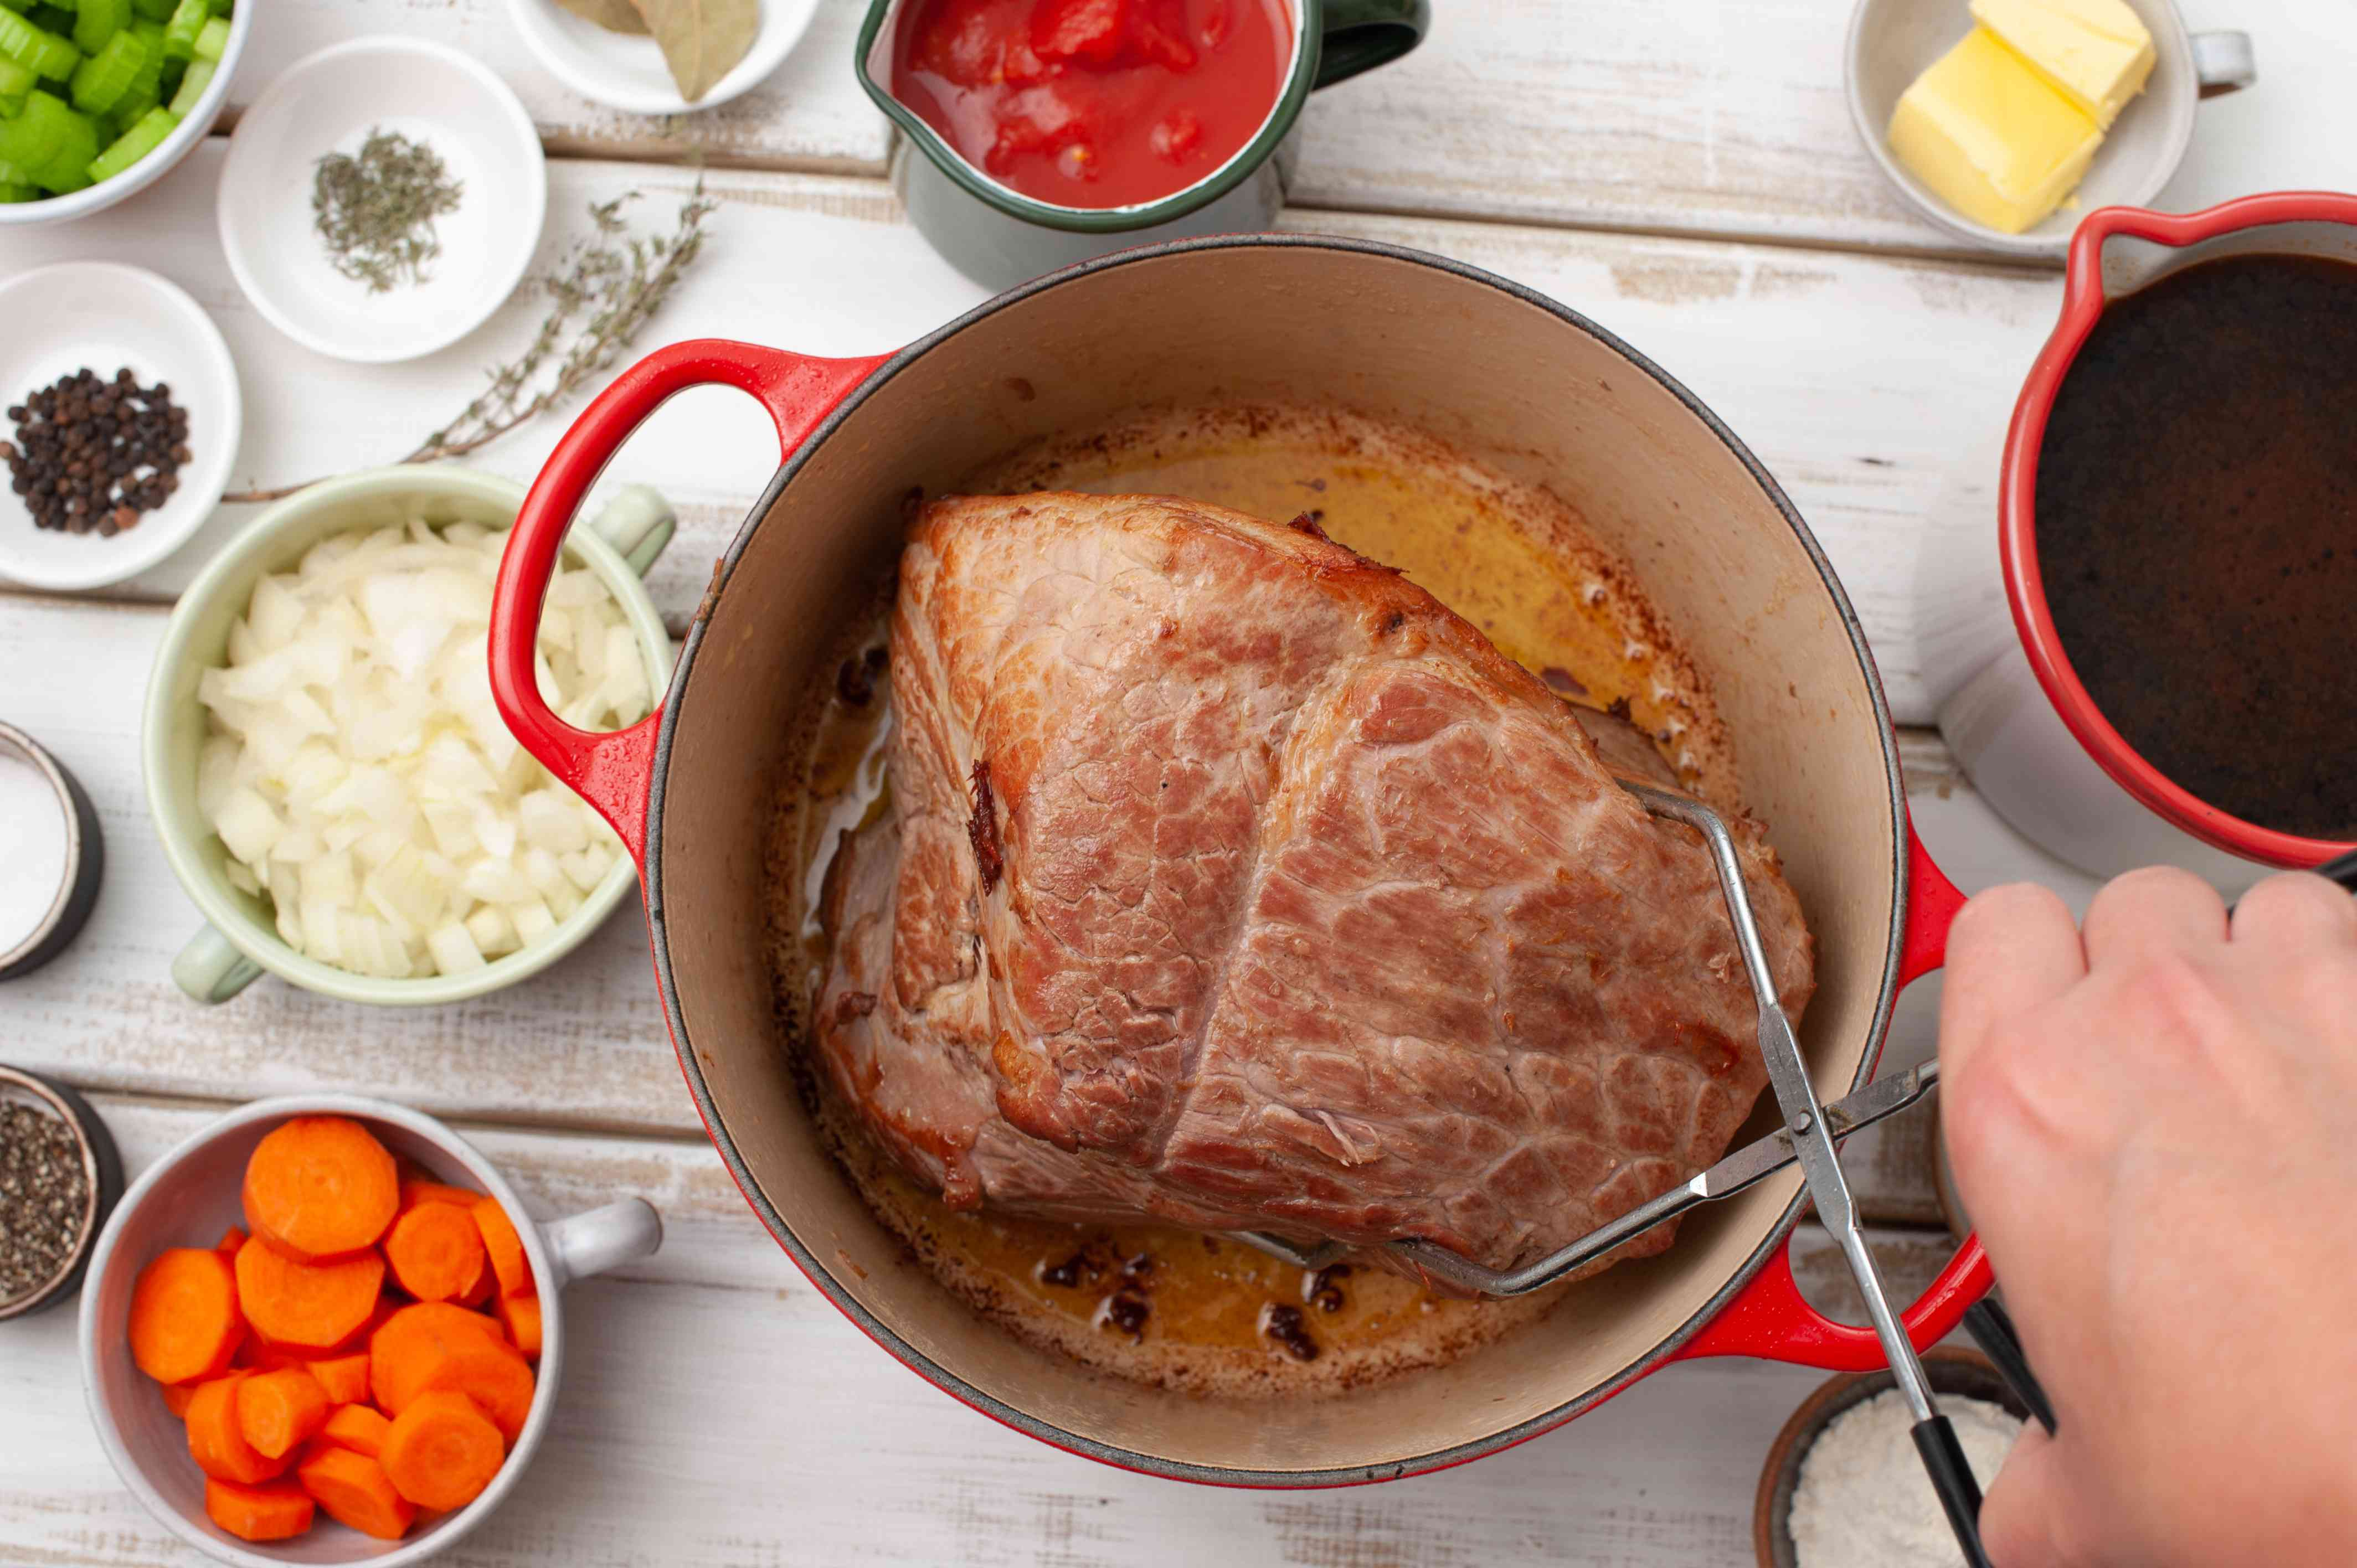 Put roast in pot